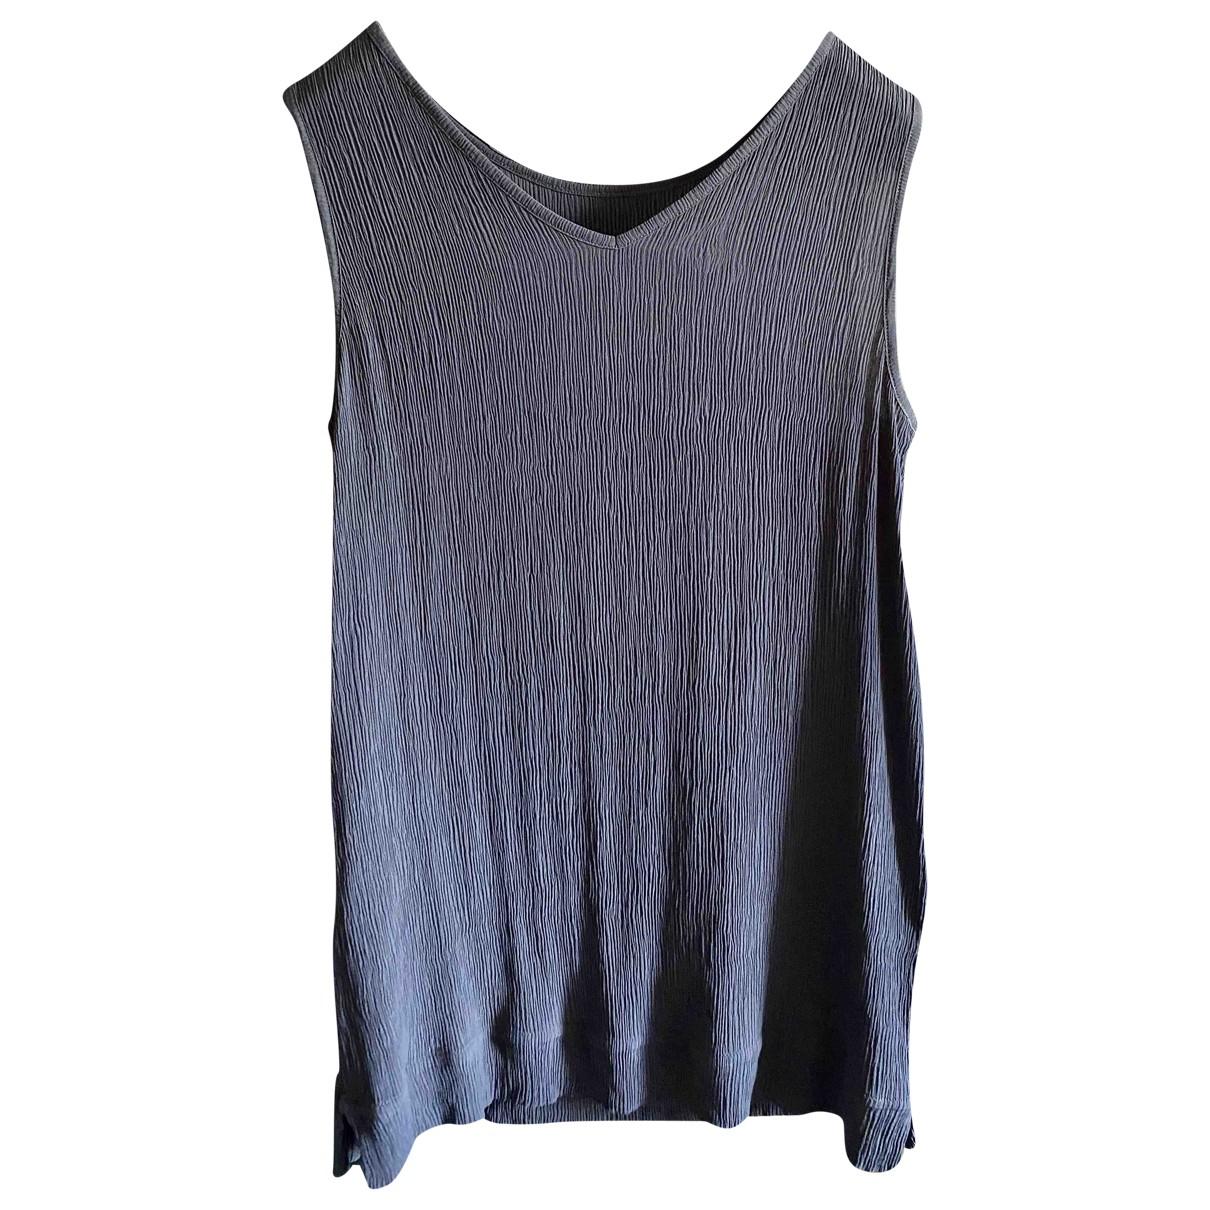 Fabiana Filippi \N Anthracite Silk  top for Women 40 IT